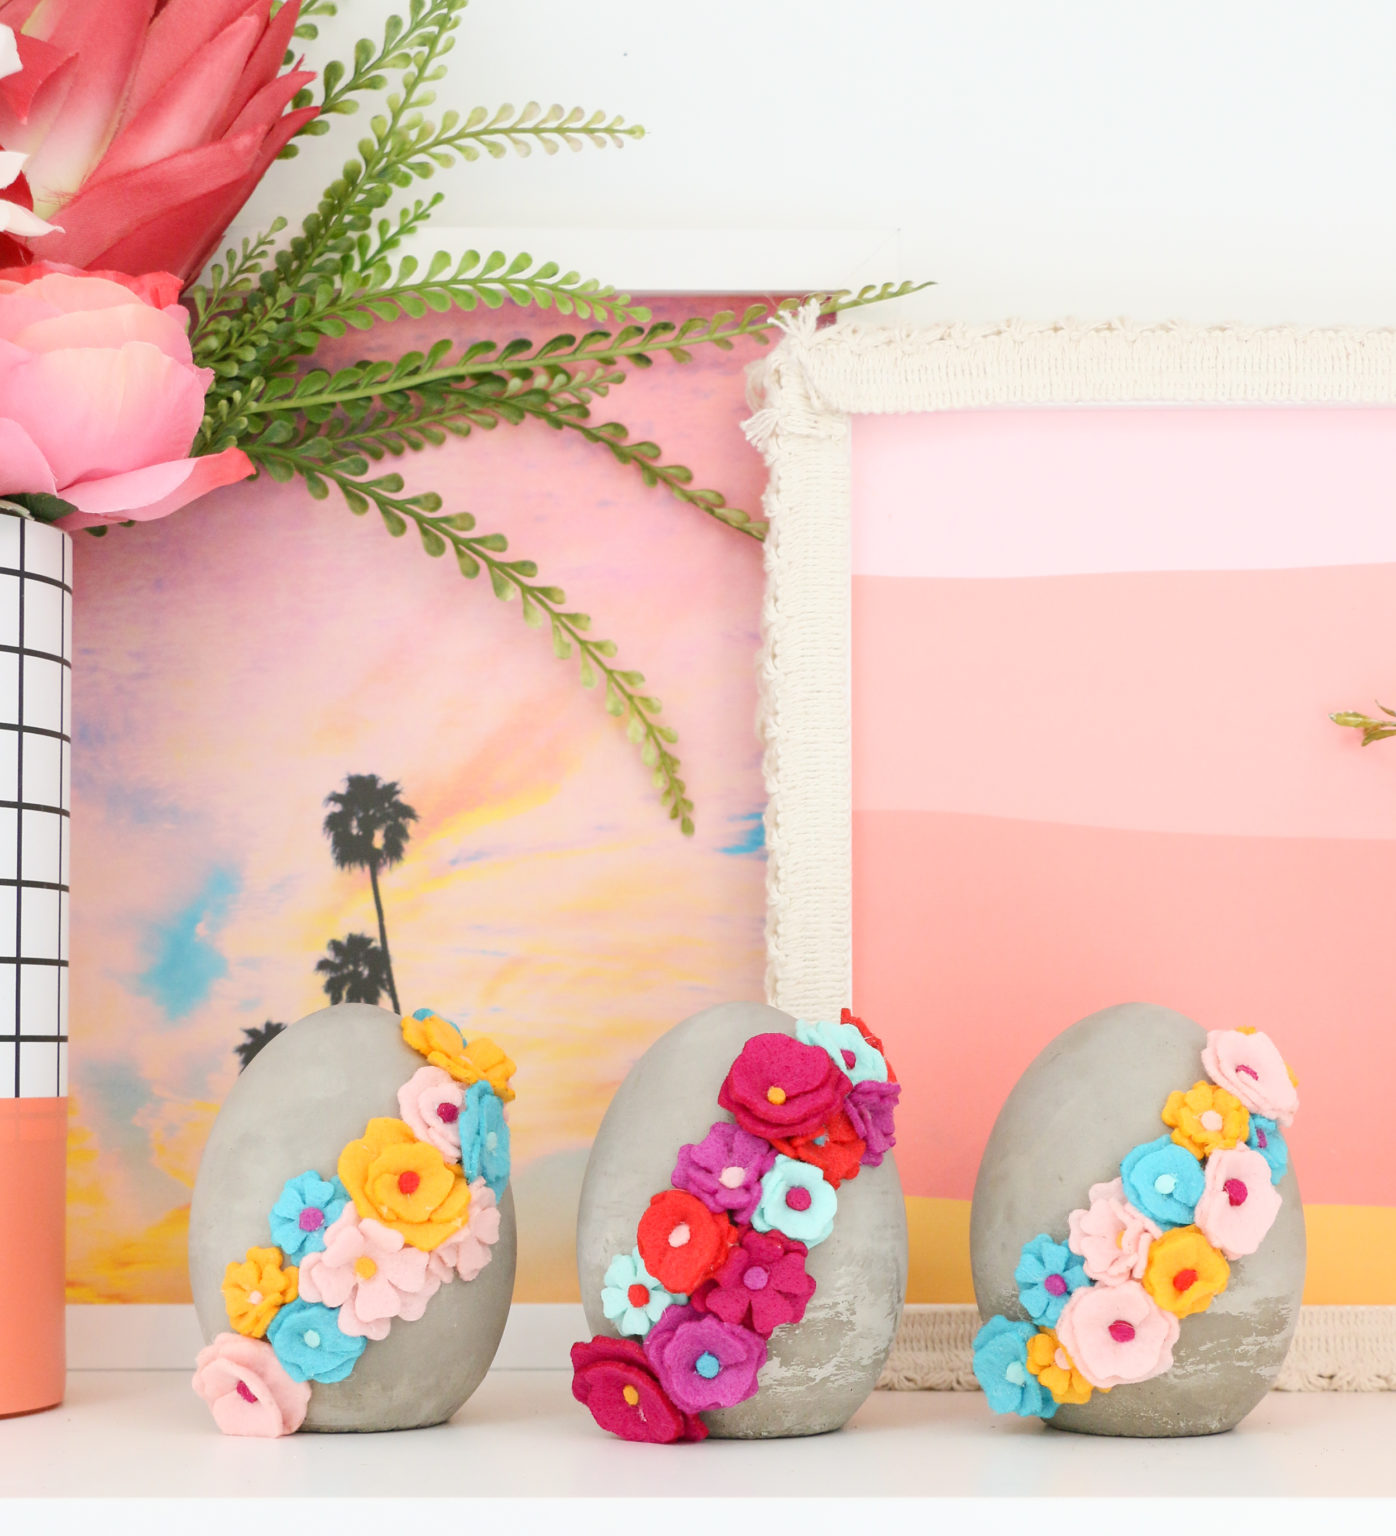 DIY-Felt-Flower-Wrapped-Cement-Eggs-10-1396x1536